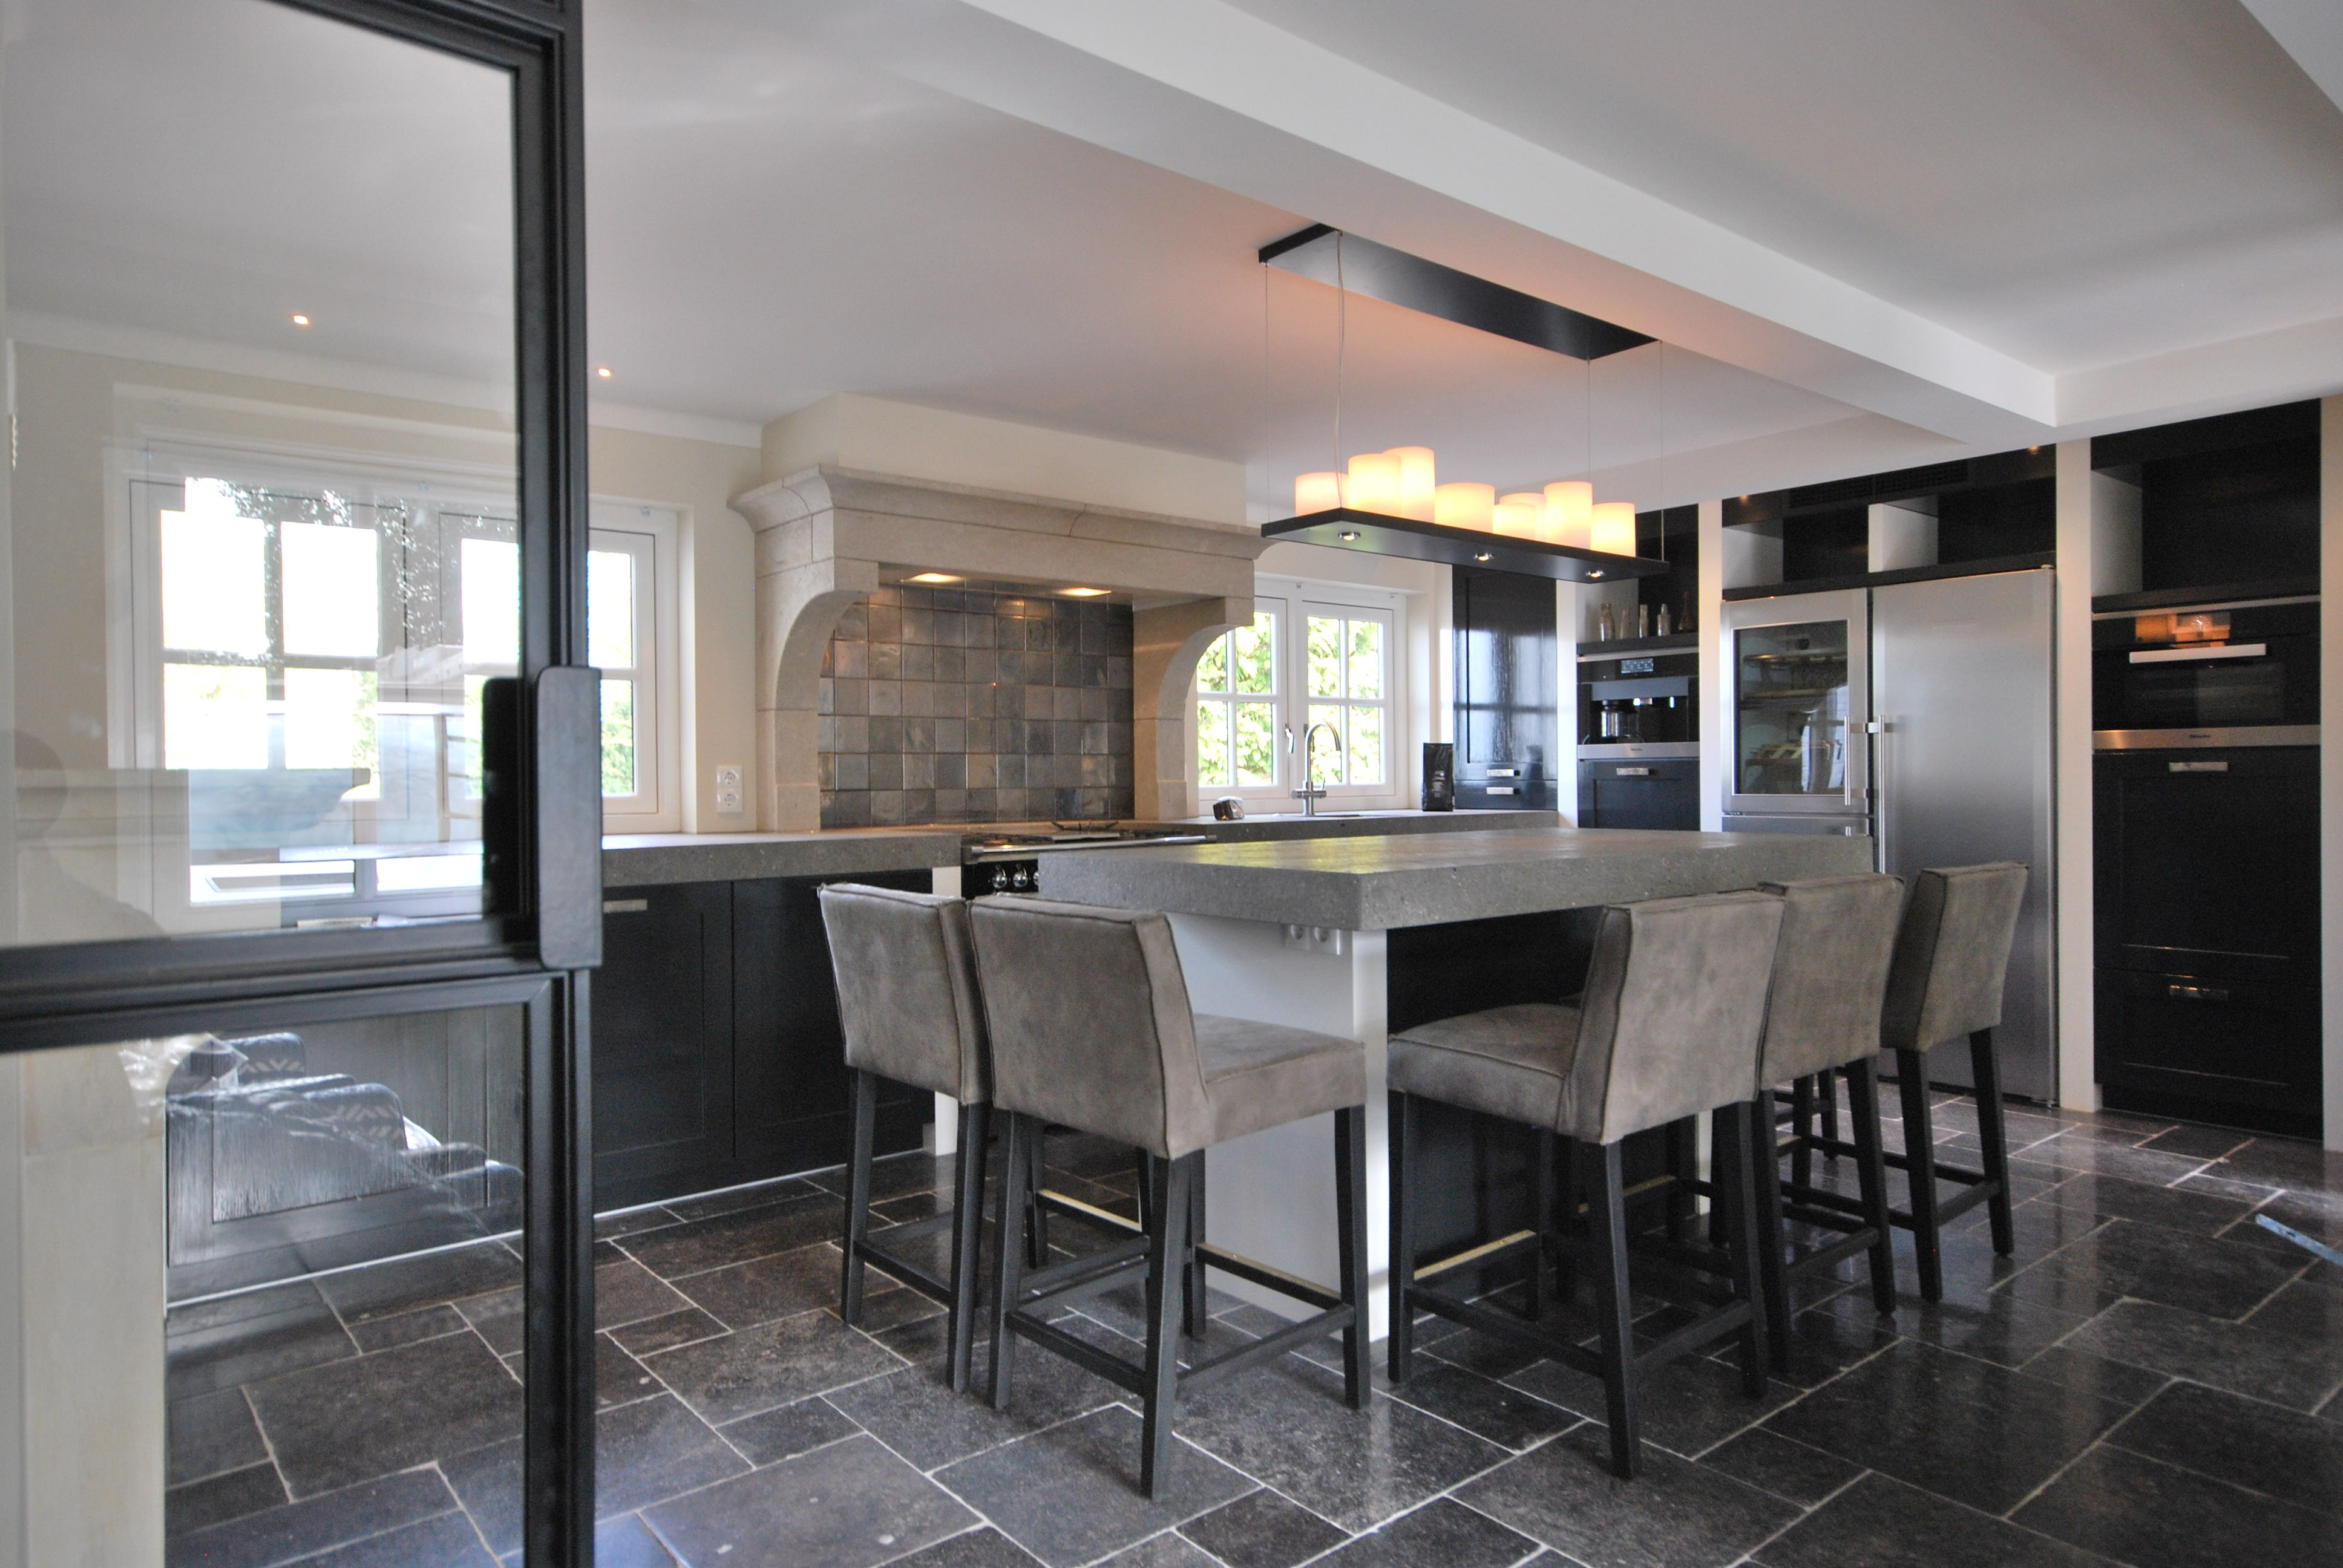 Roukens keukens keukenarchitectuur for Modern keukenhout